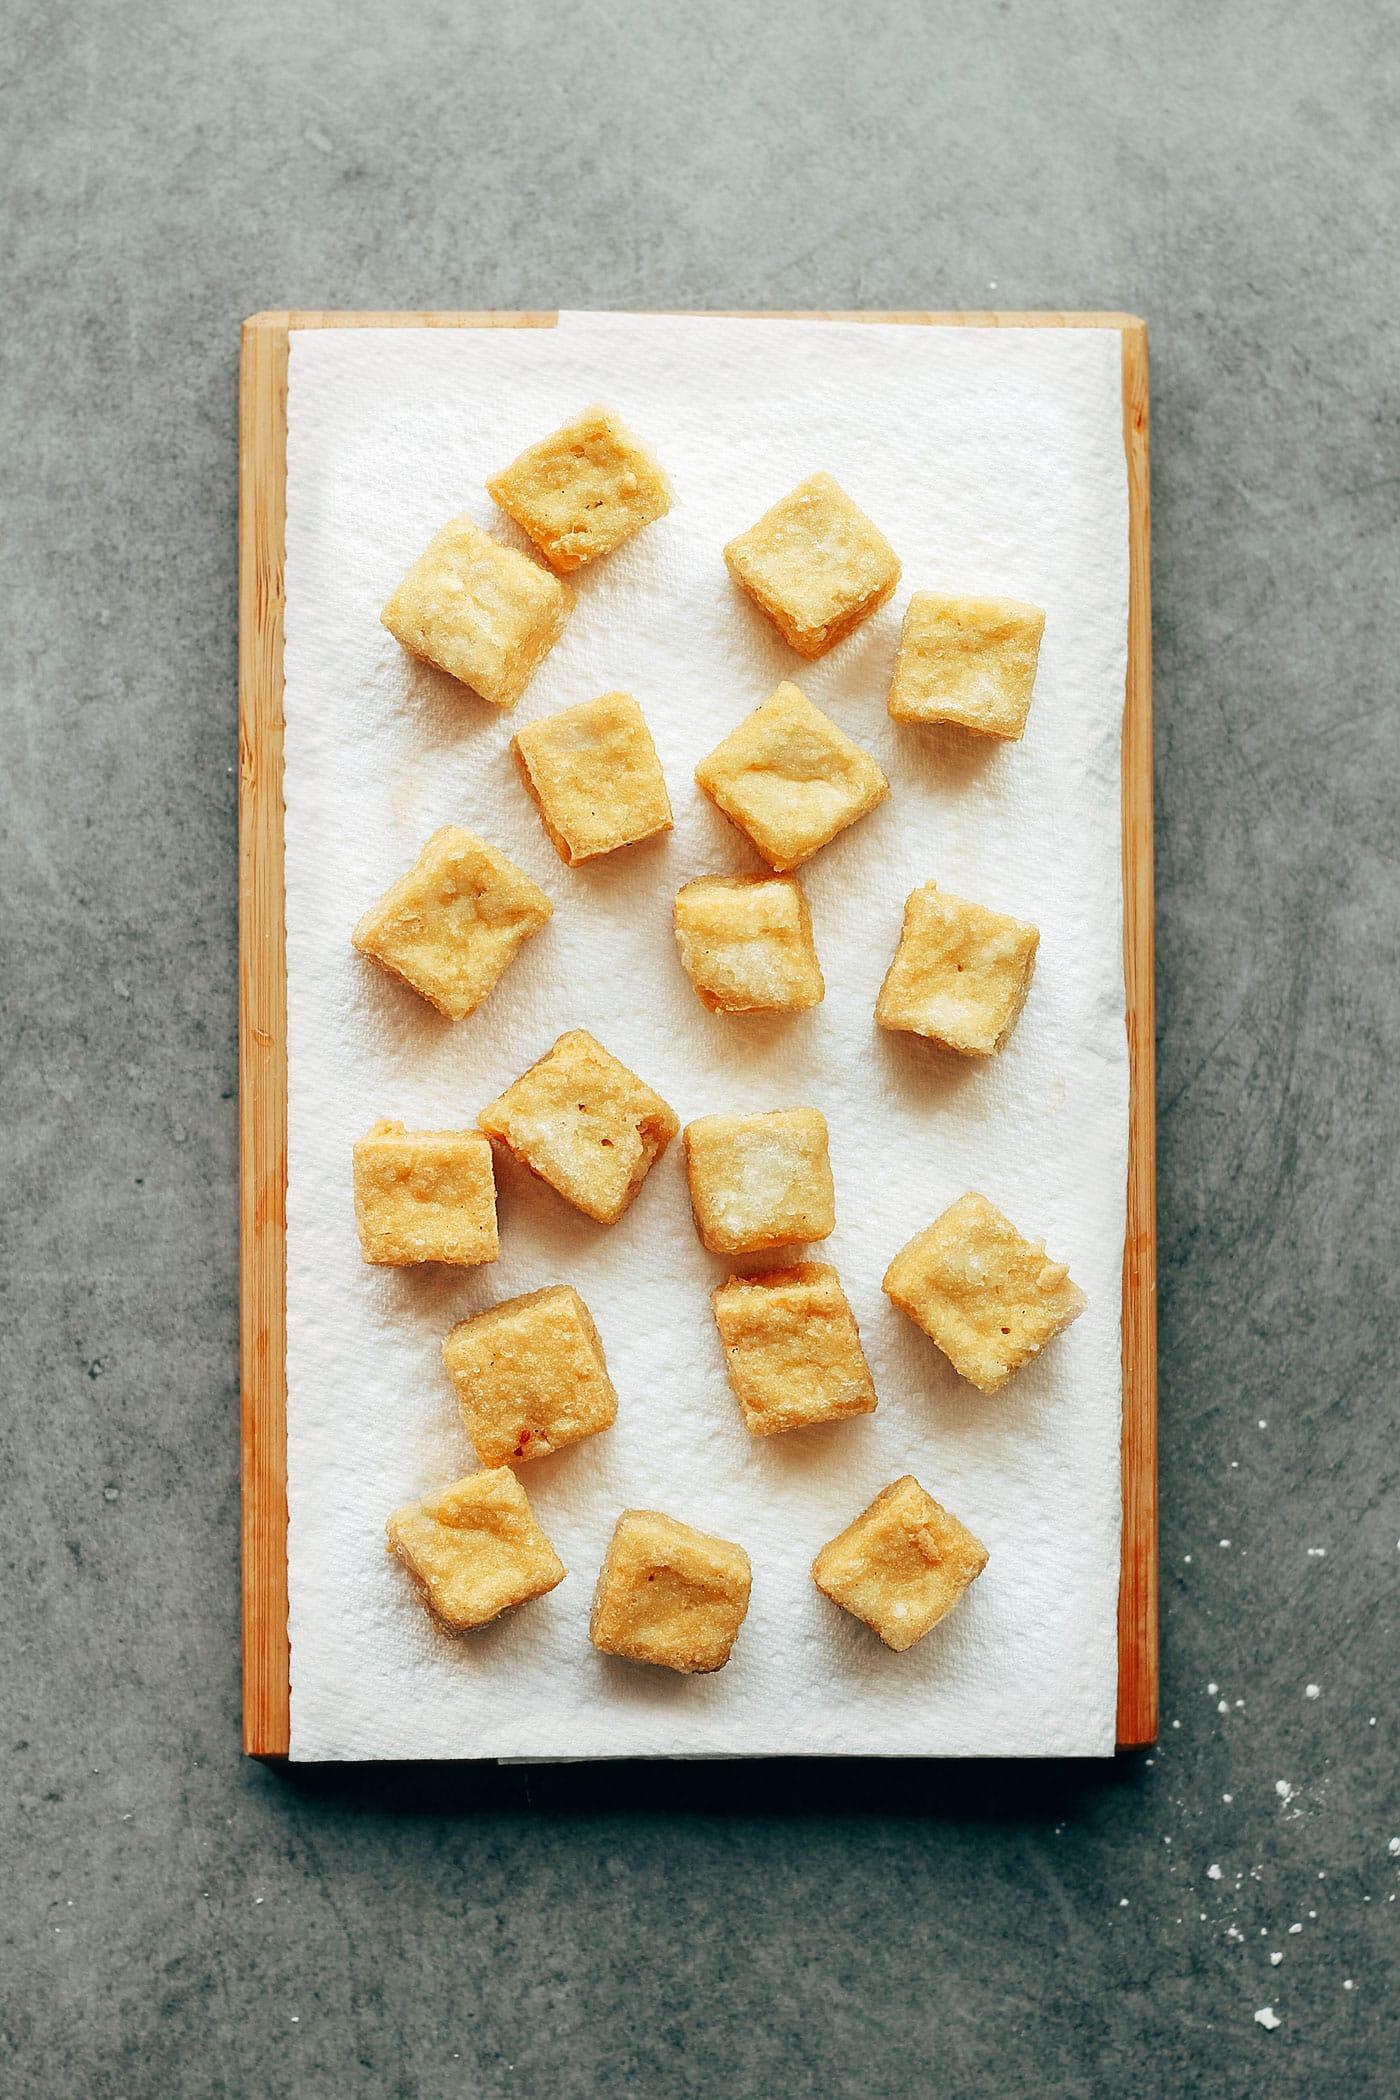 Sweet Chili Tofu Bowls